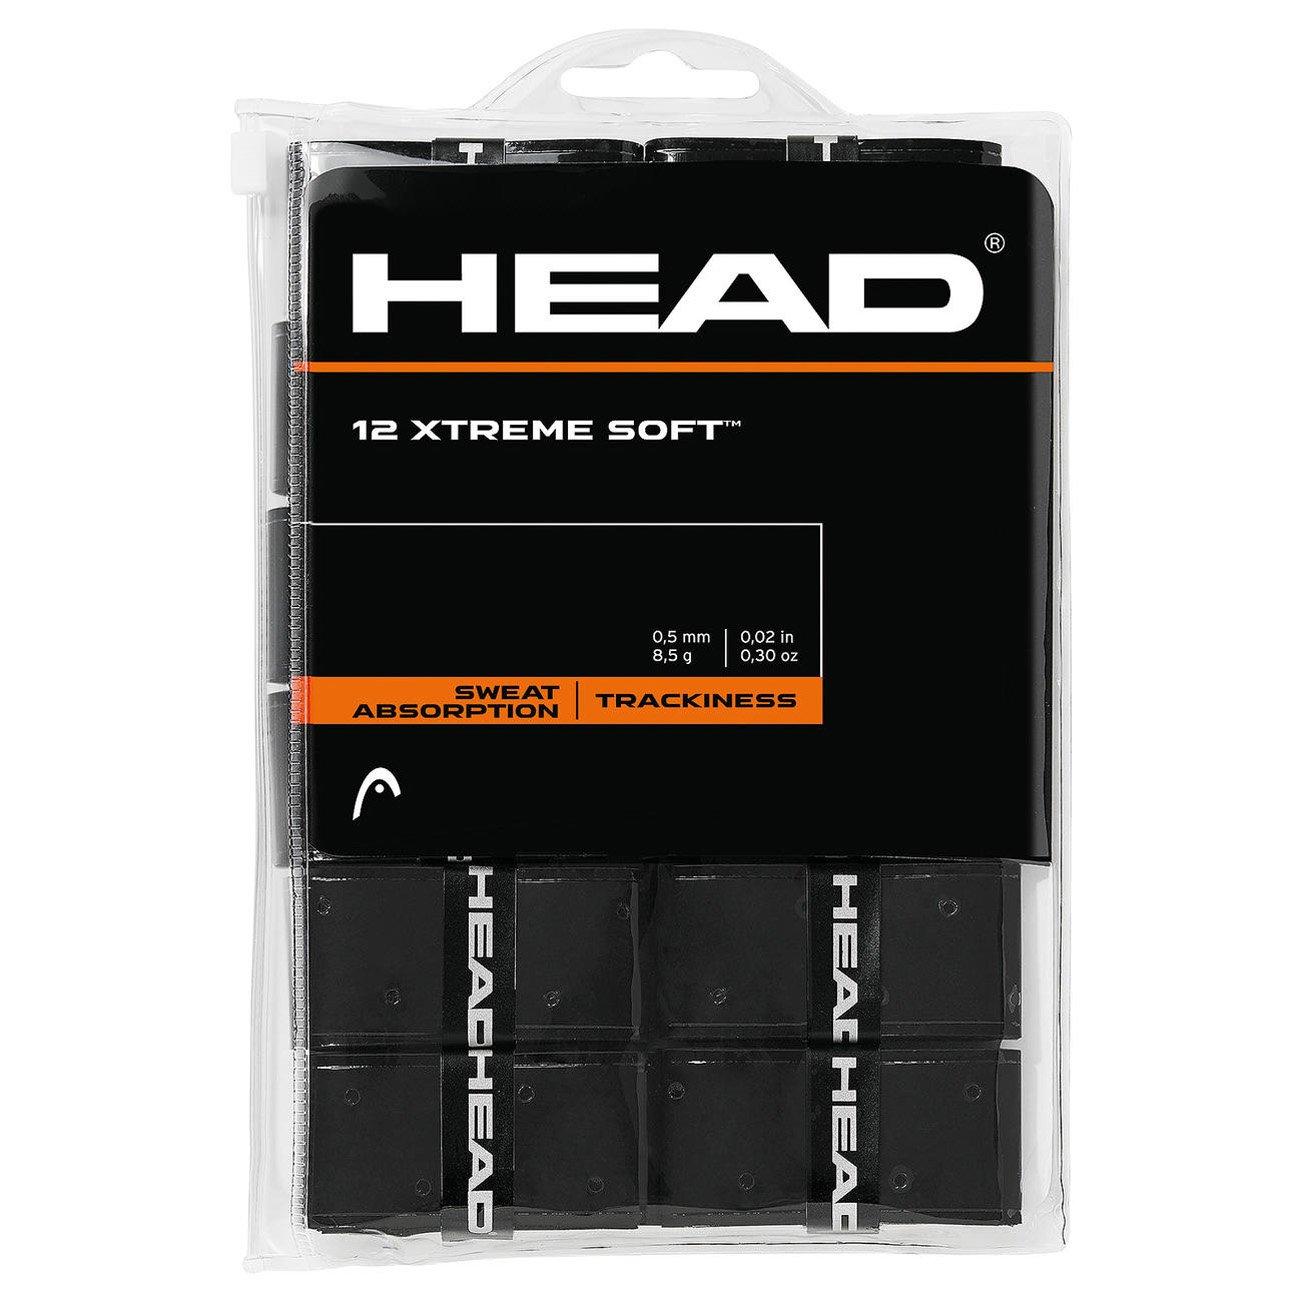 12 Overgrip Head Xtreme Soft negro tennis grips Cinta para mango de raqueta de tenis